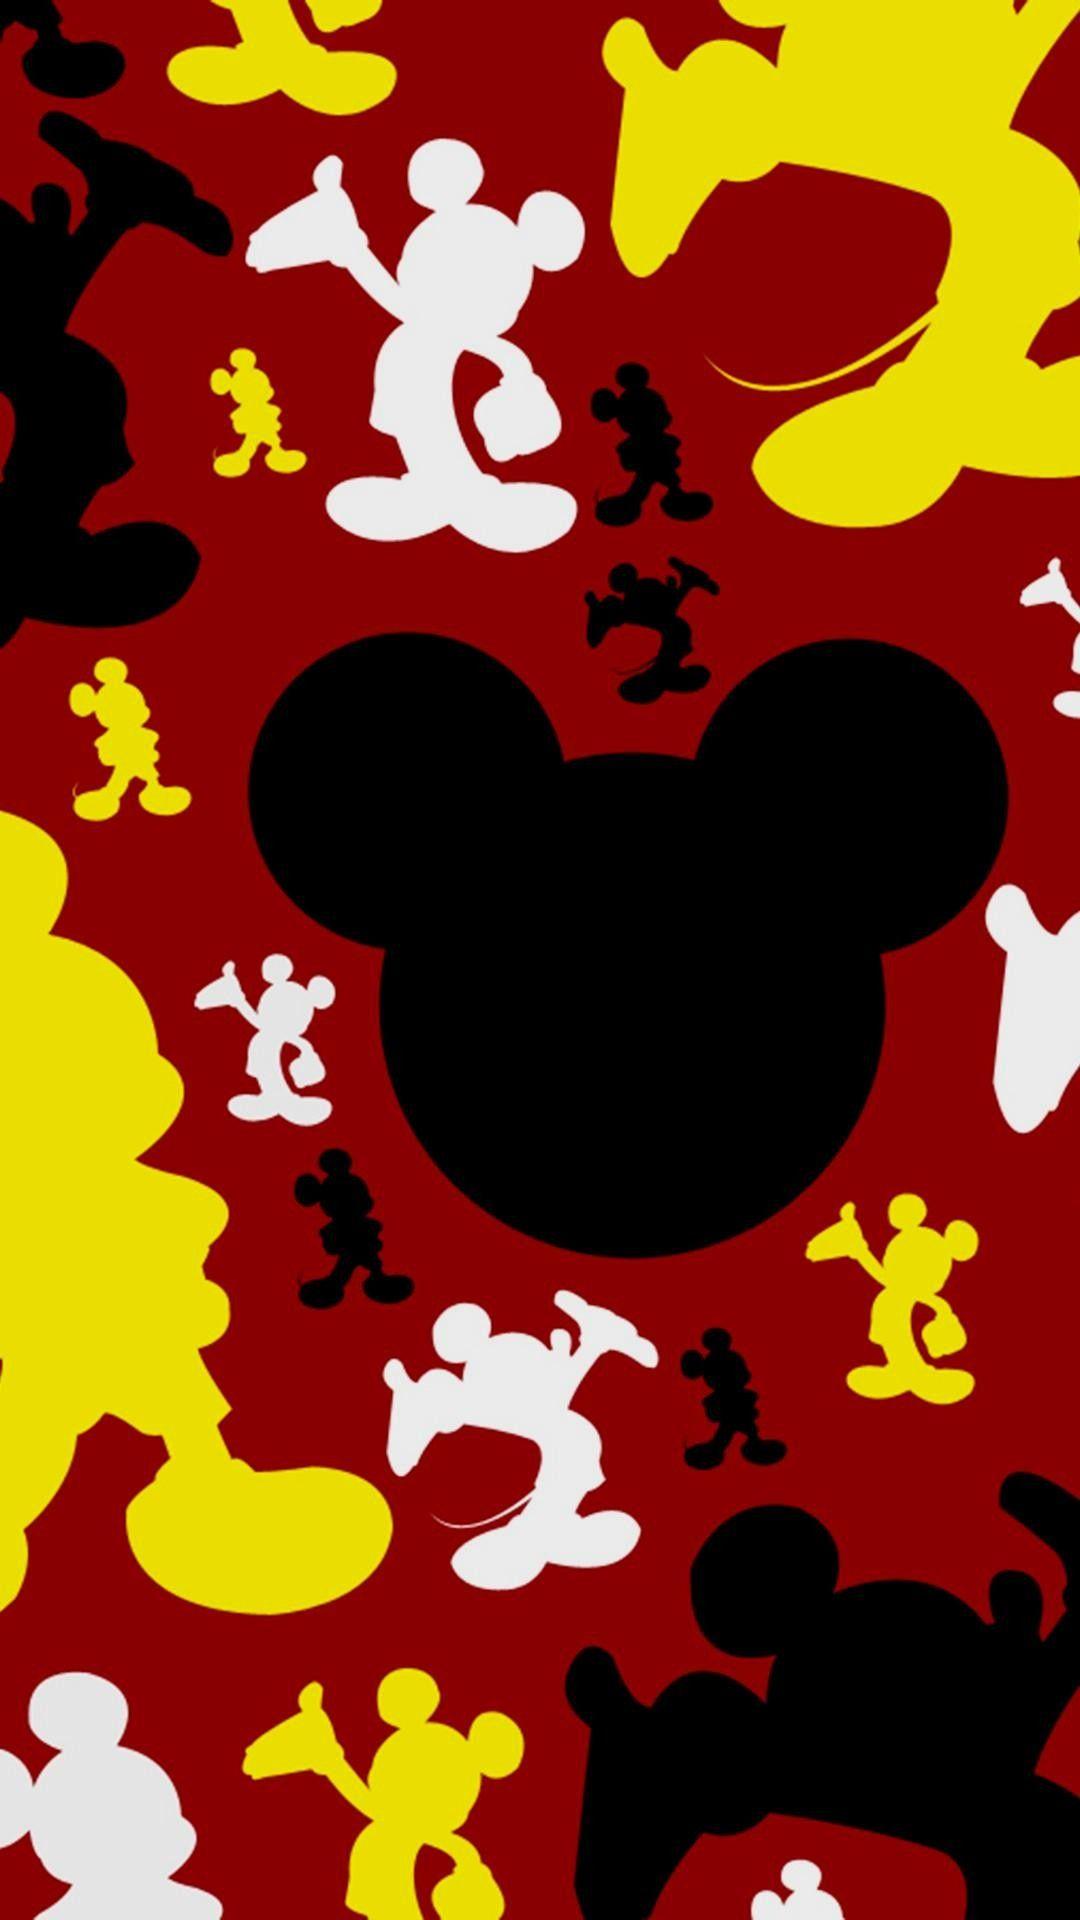 Wallpaper iphone mickey - Top 12 Mickey Mouse Wallpaper Iphone 6 Plus Grandes Aplicativos Para Iphone